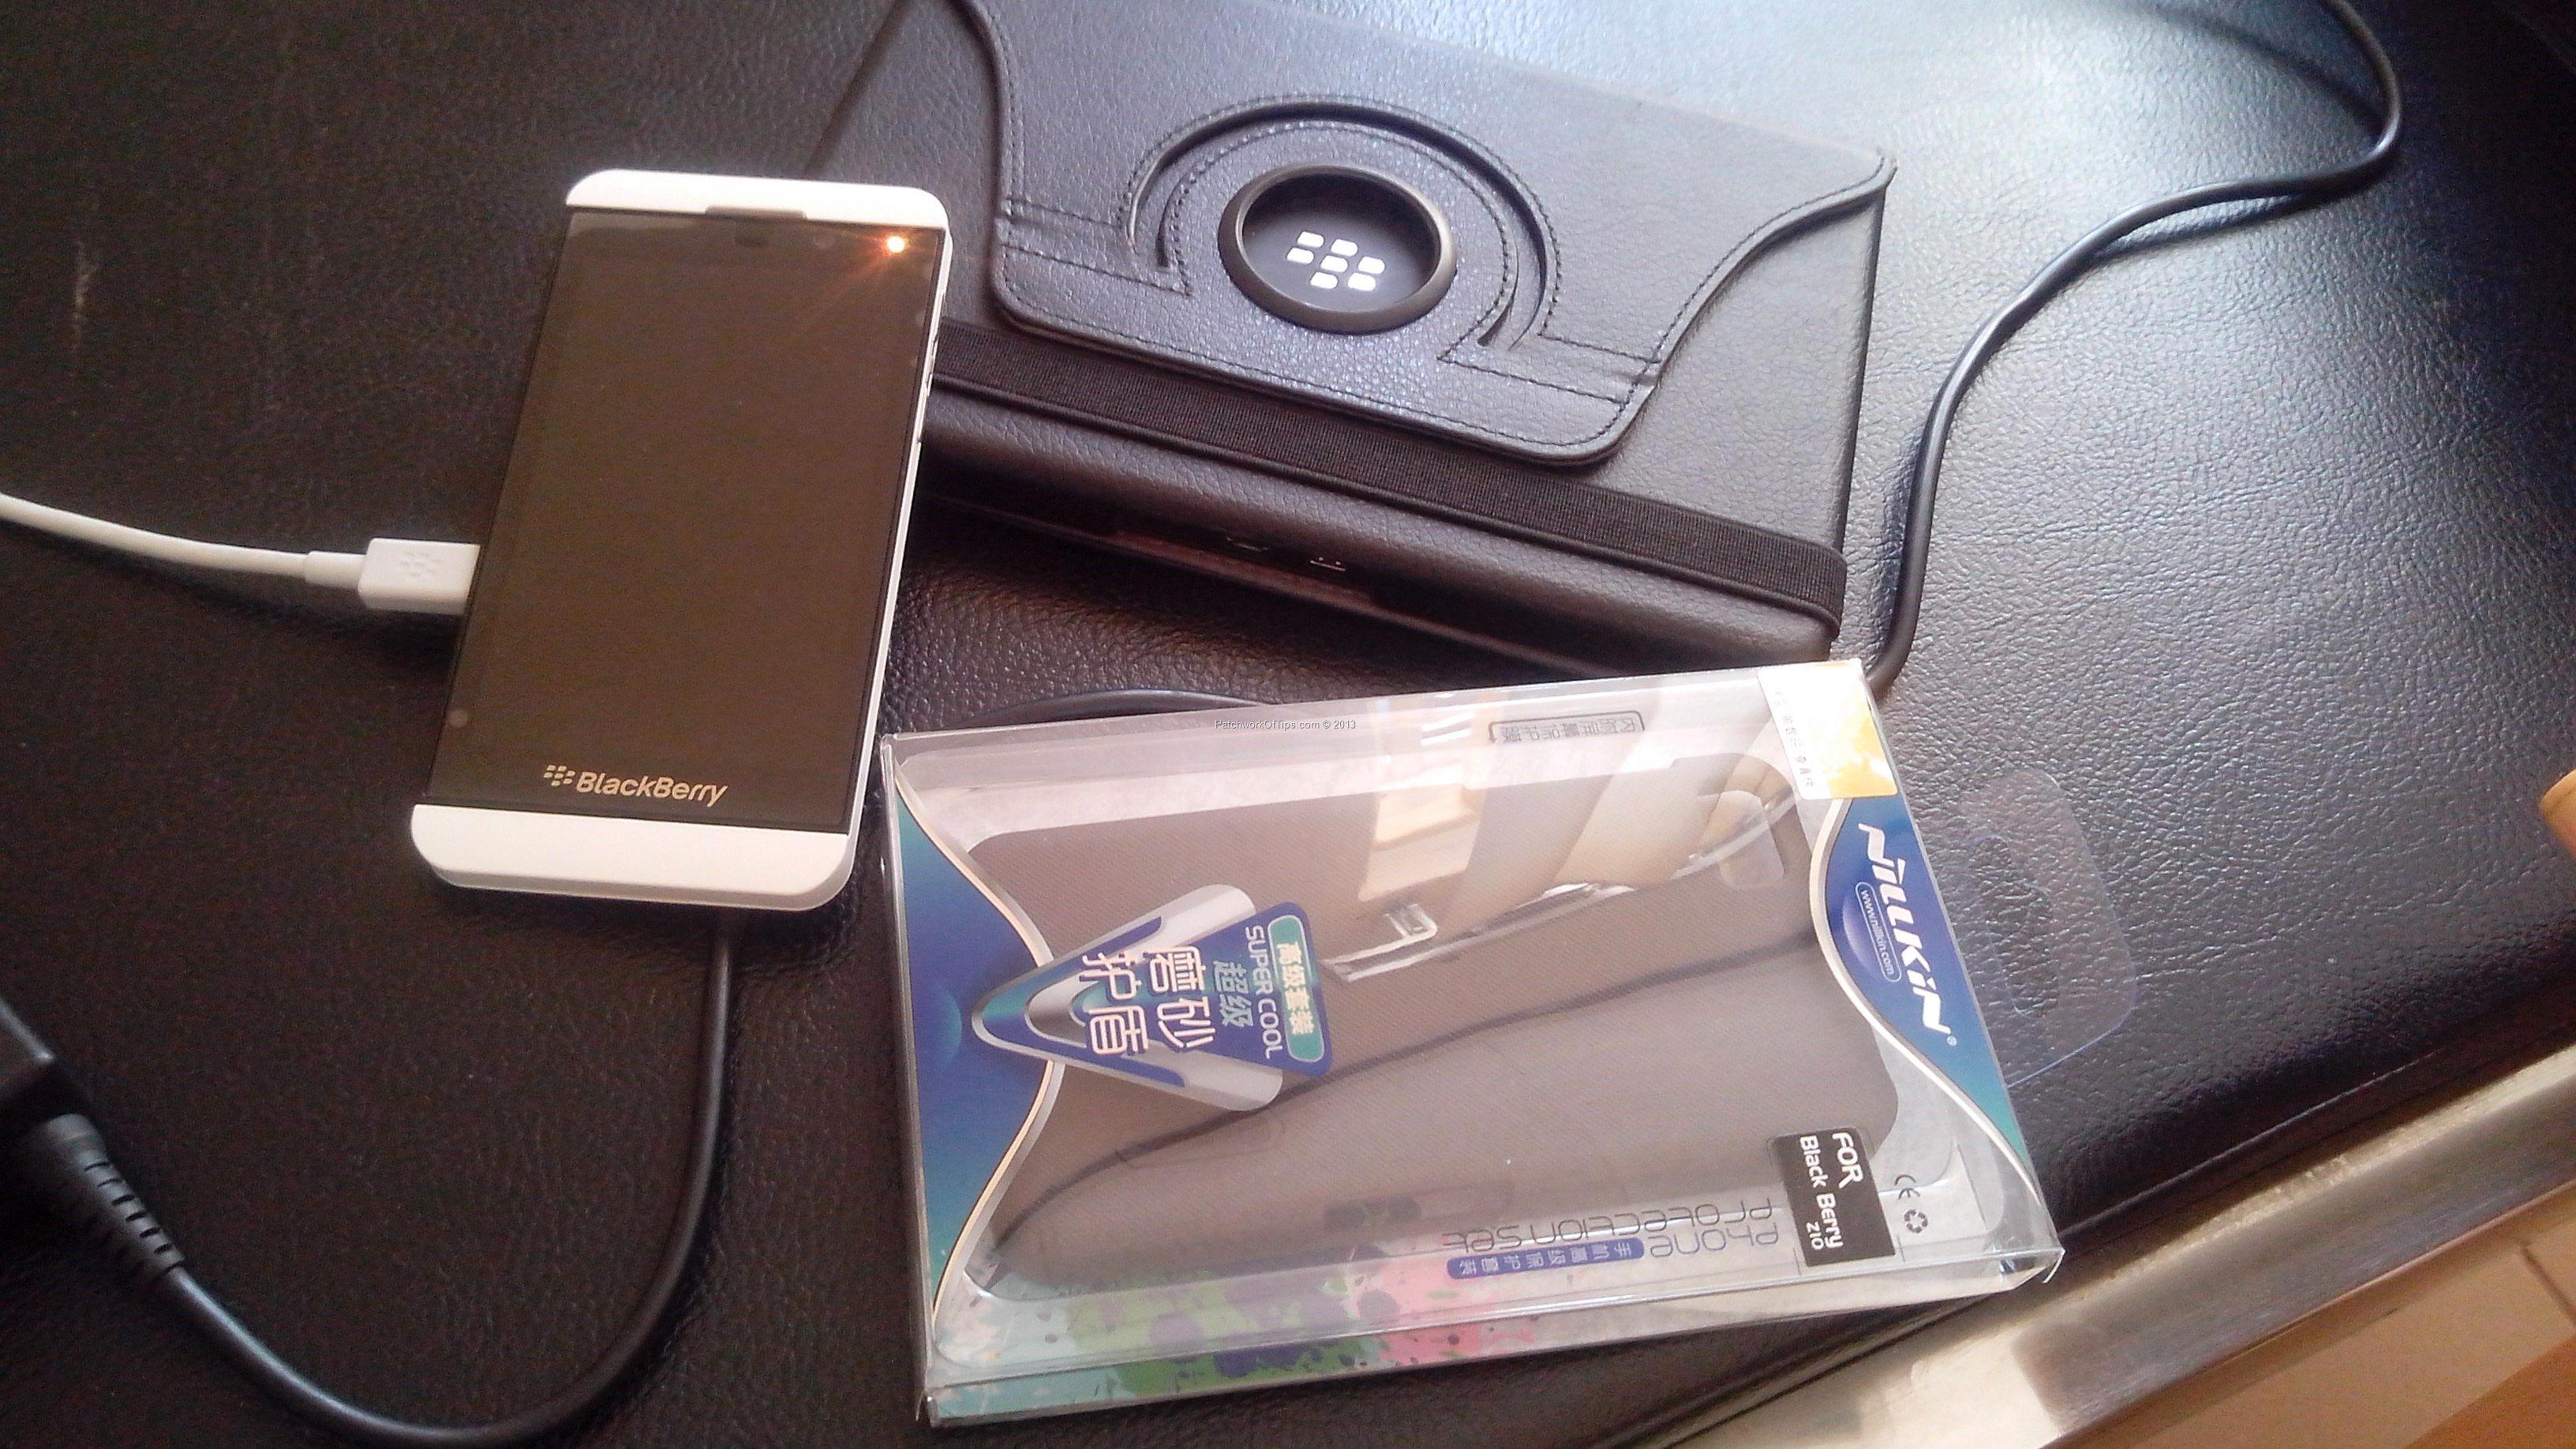 The White BlackBerry Z10 3G Smartphone Review - Tech Reviews